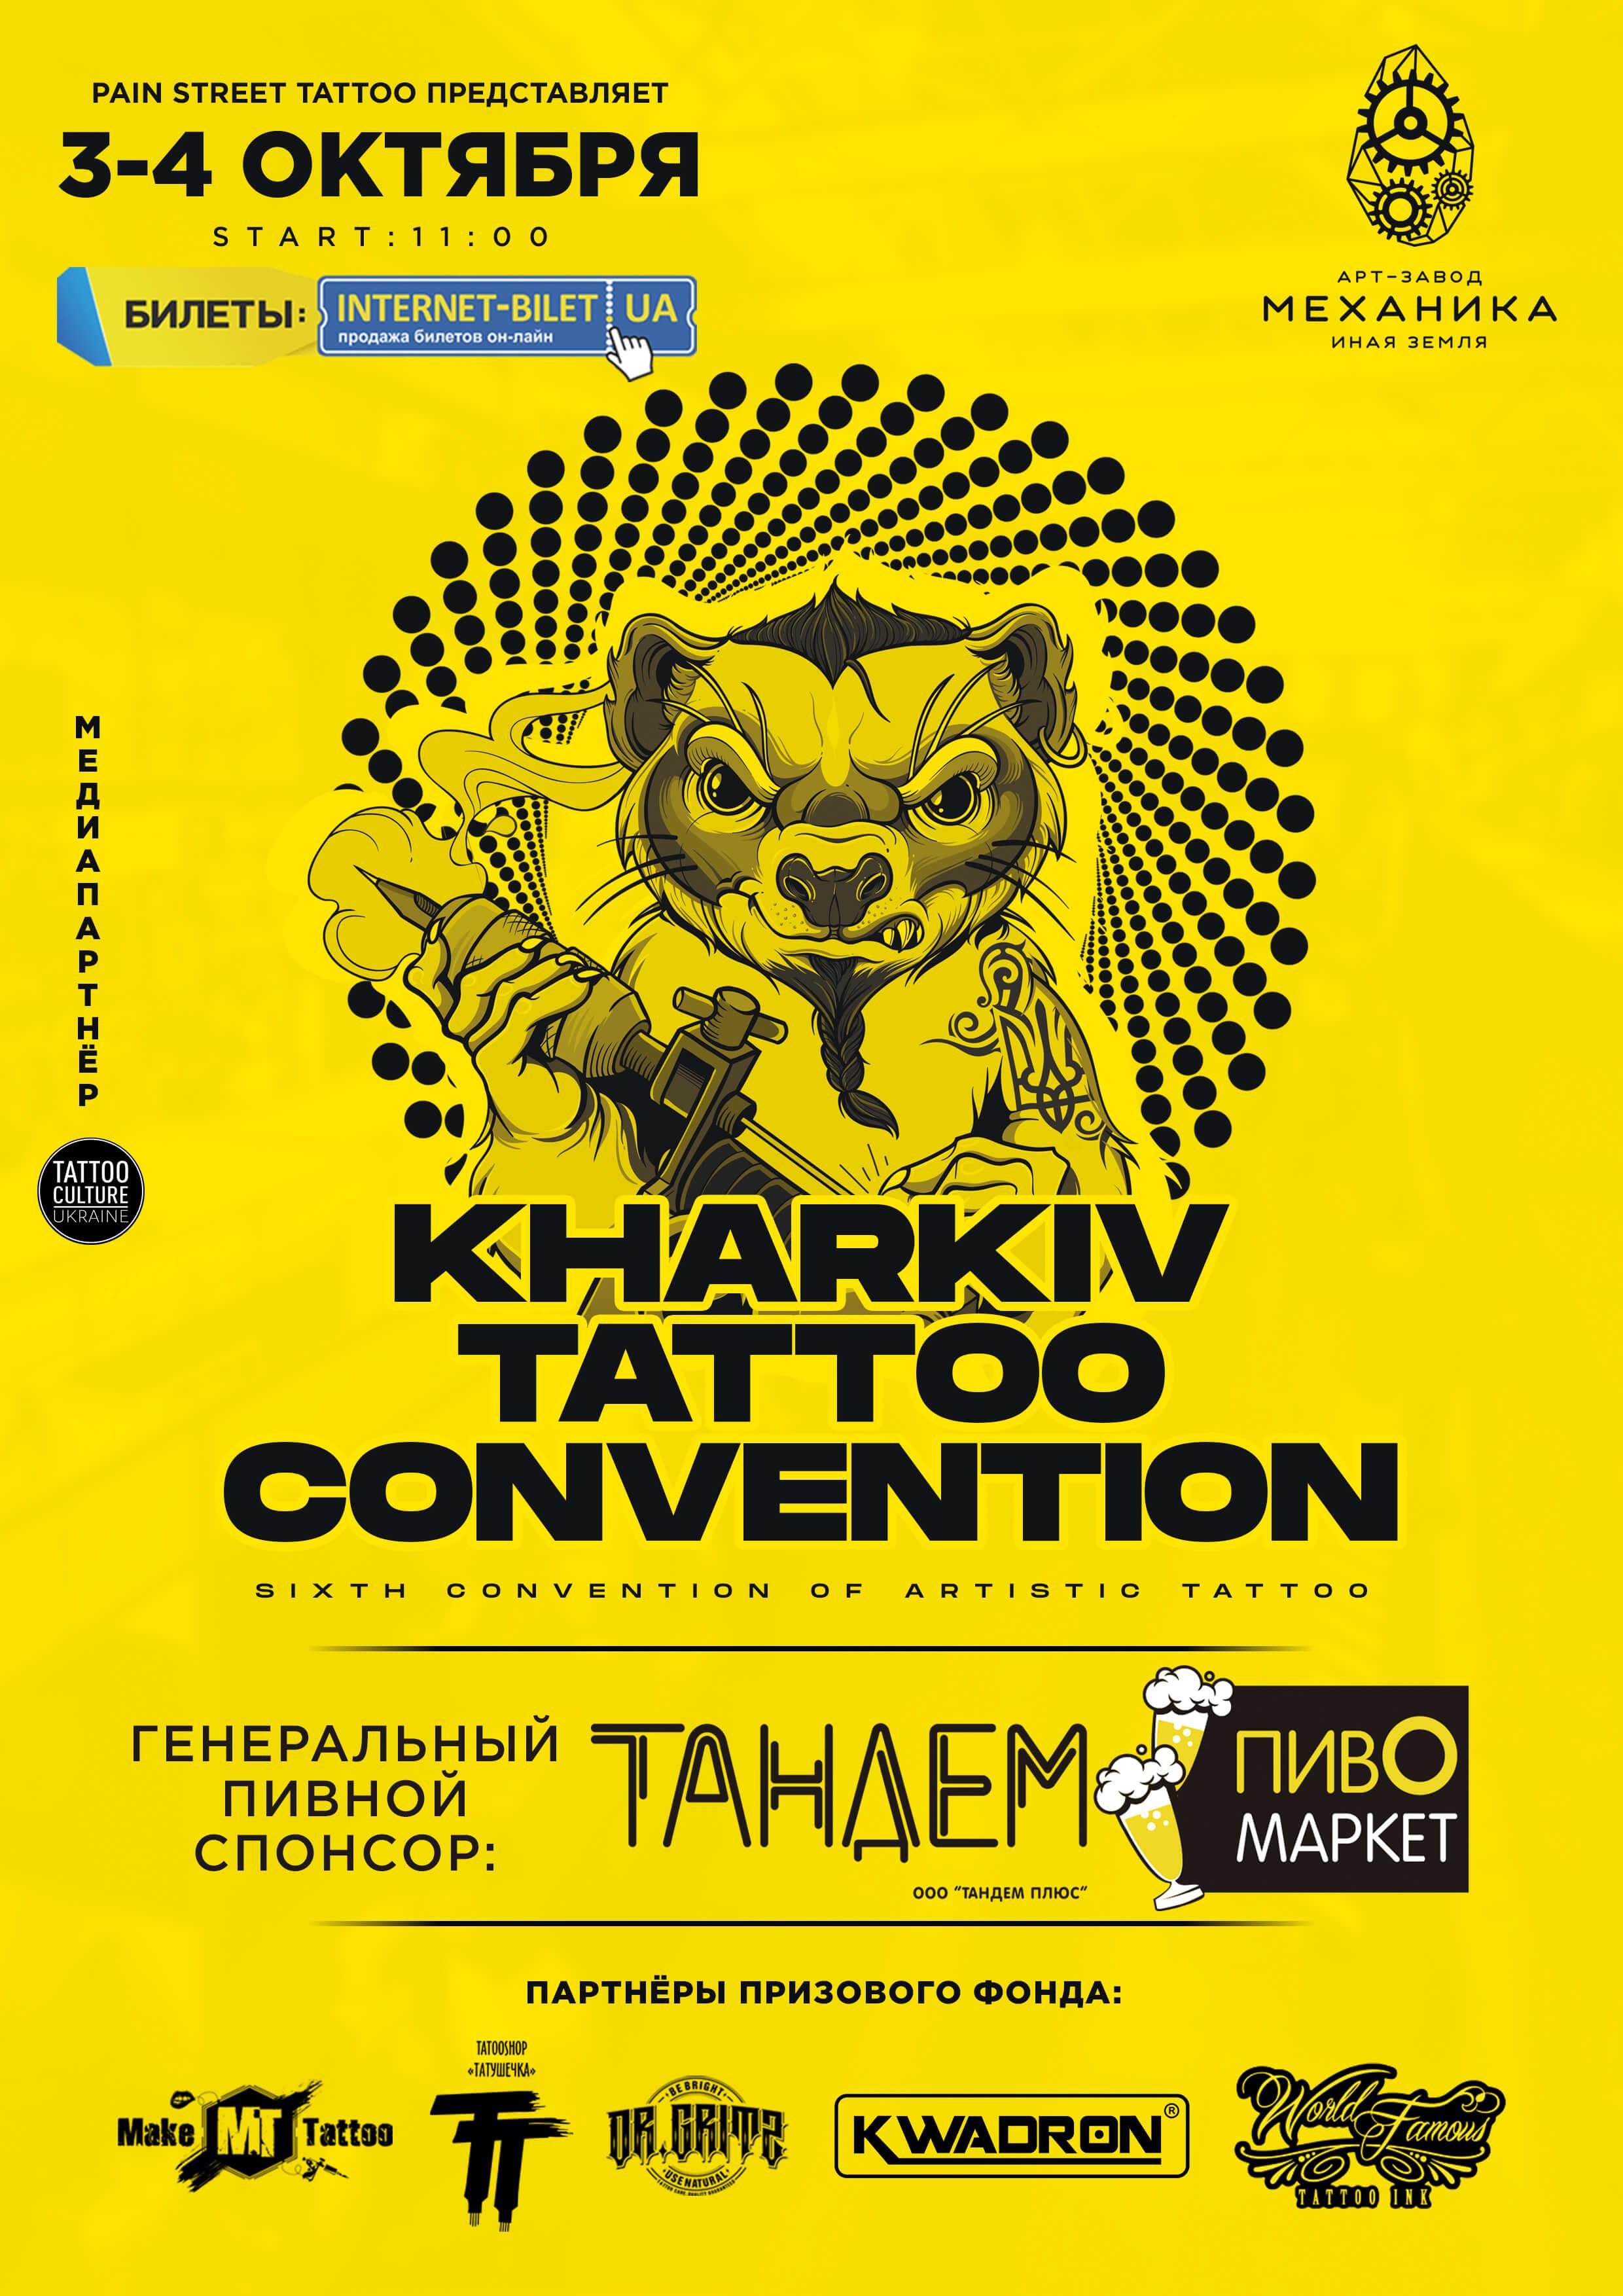 Тандем Плюс на Kharkiv Tatoo Convention 2020 3-4 Октября Арт Завод Механика